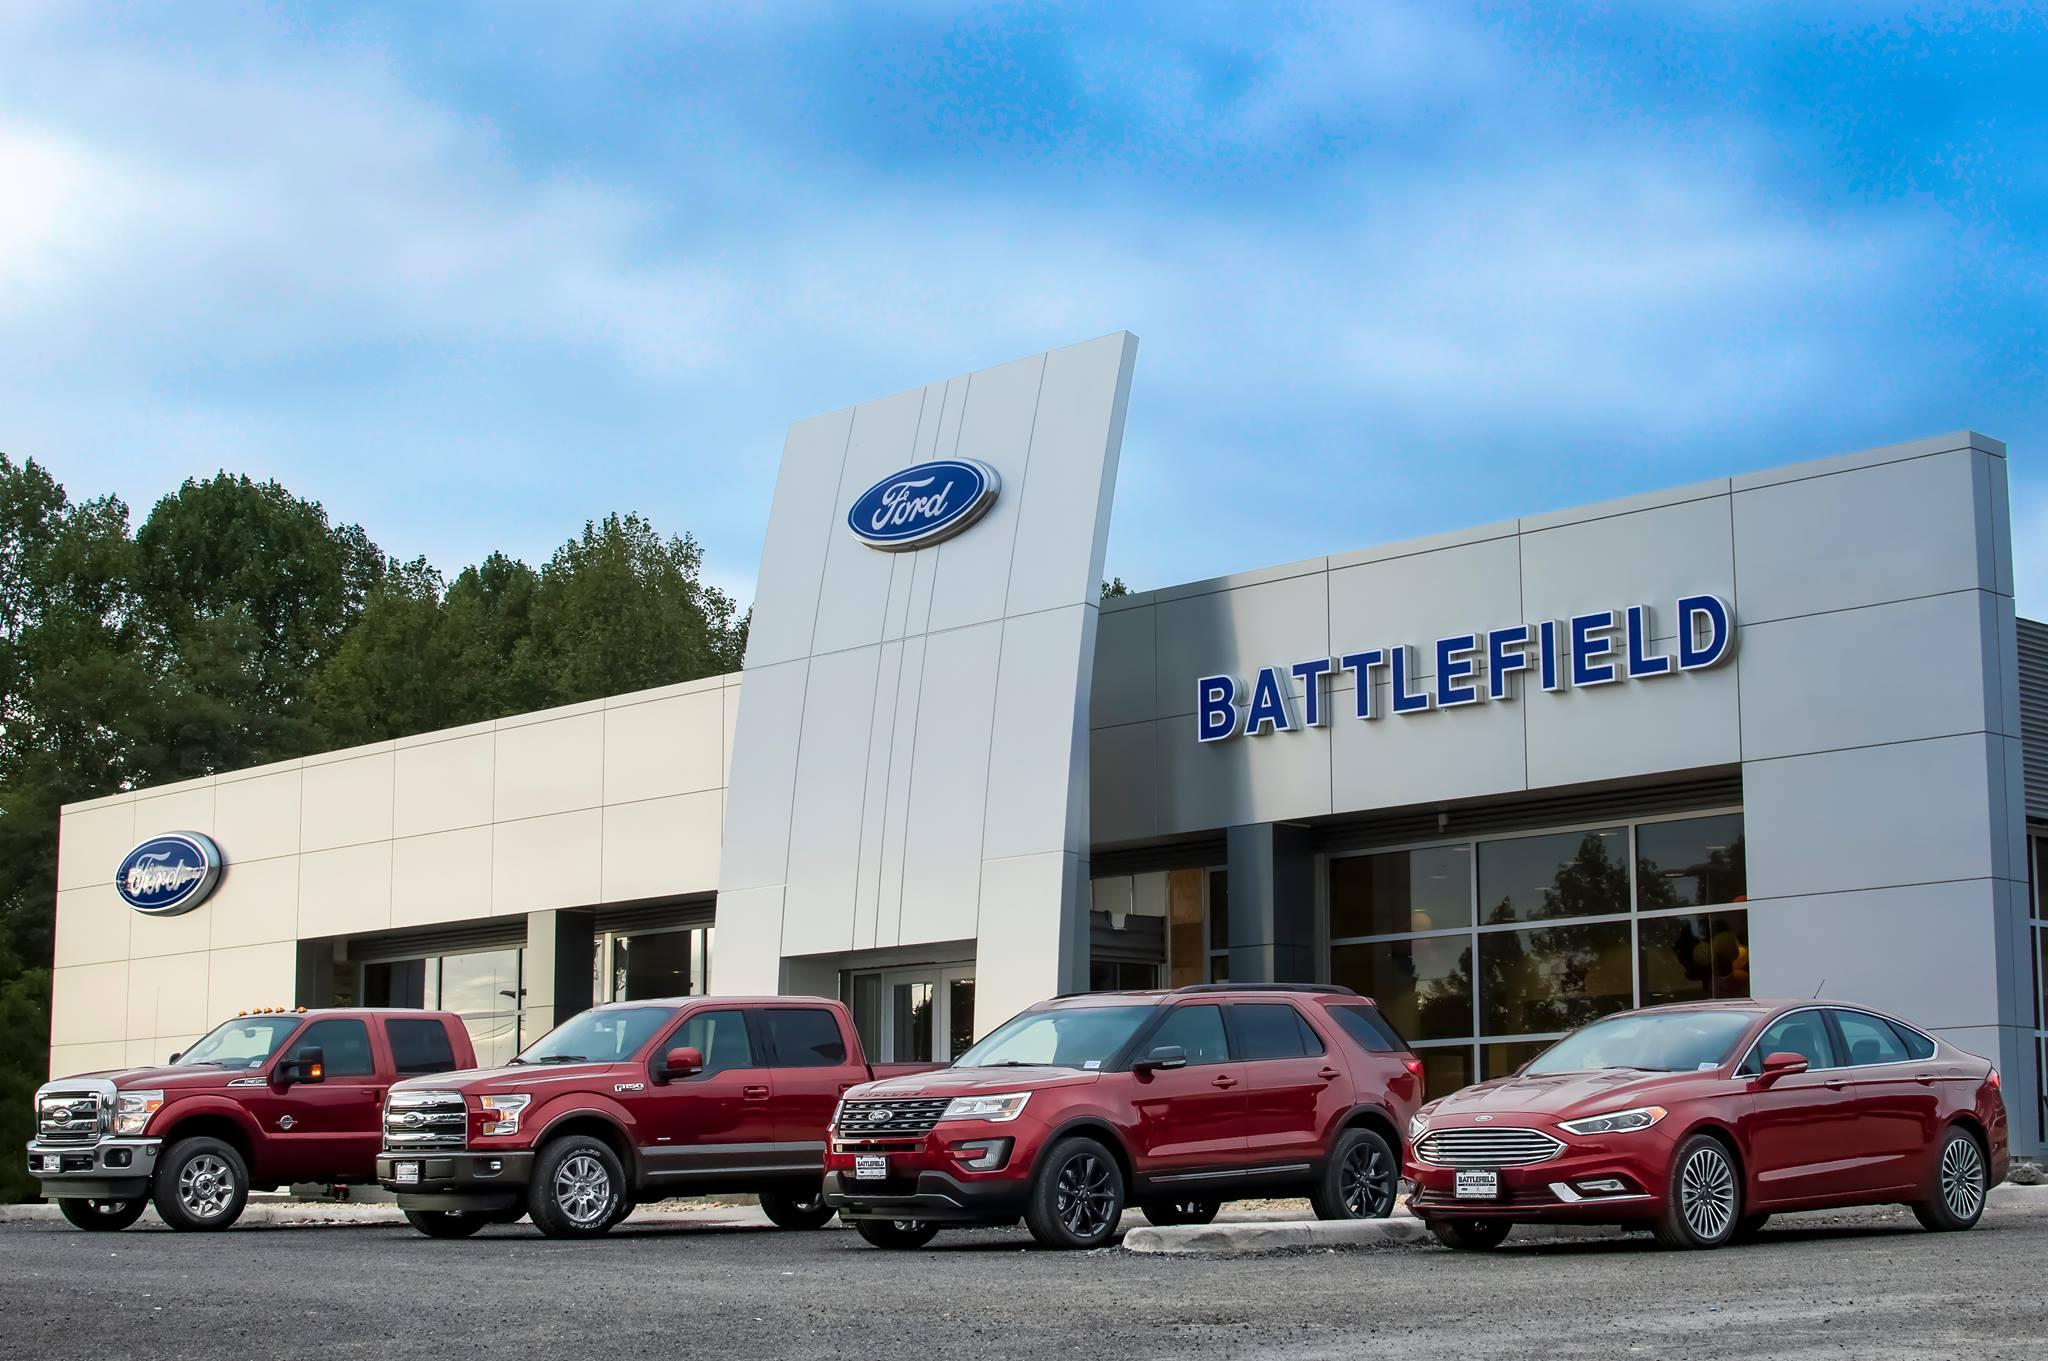 Battlefield Ford Culpeper Employees